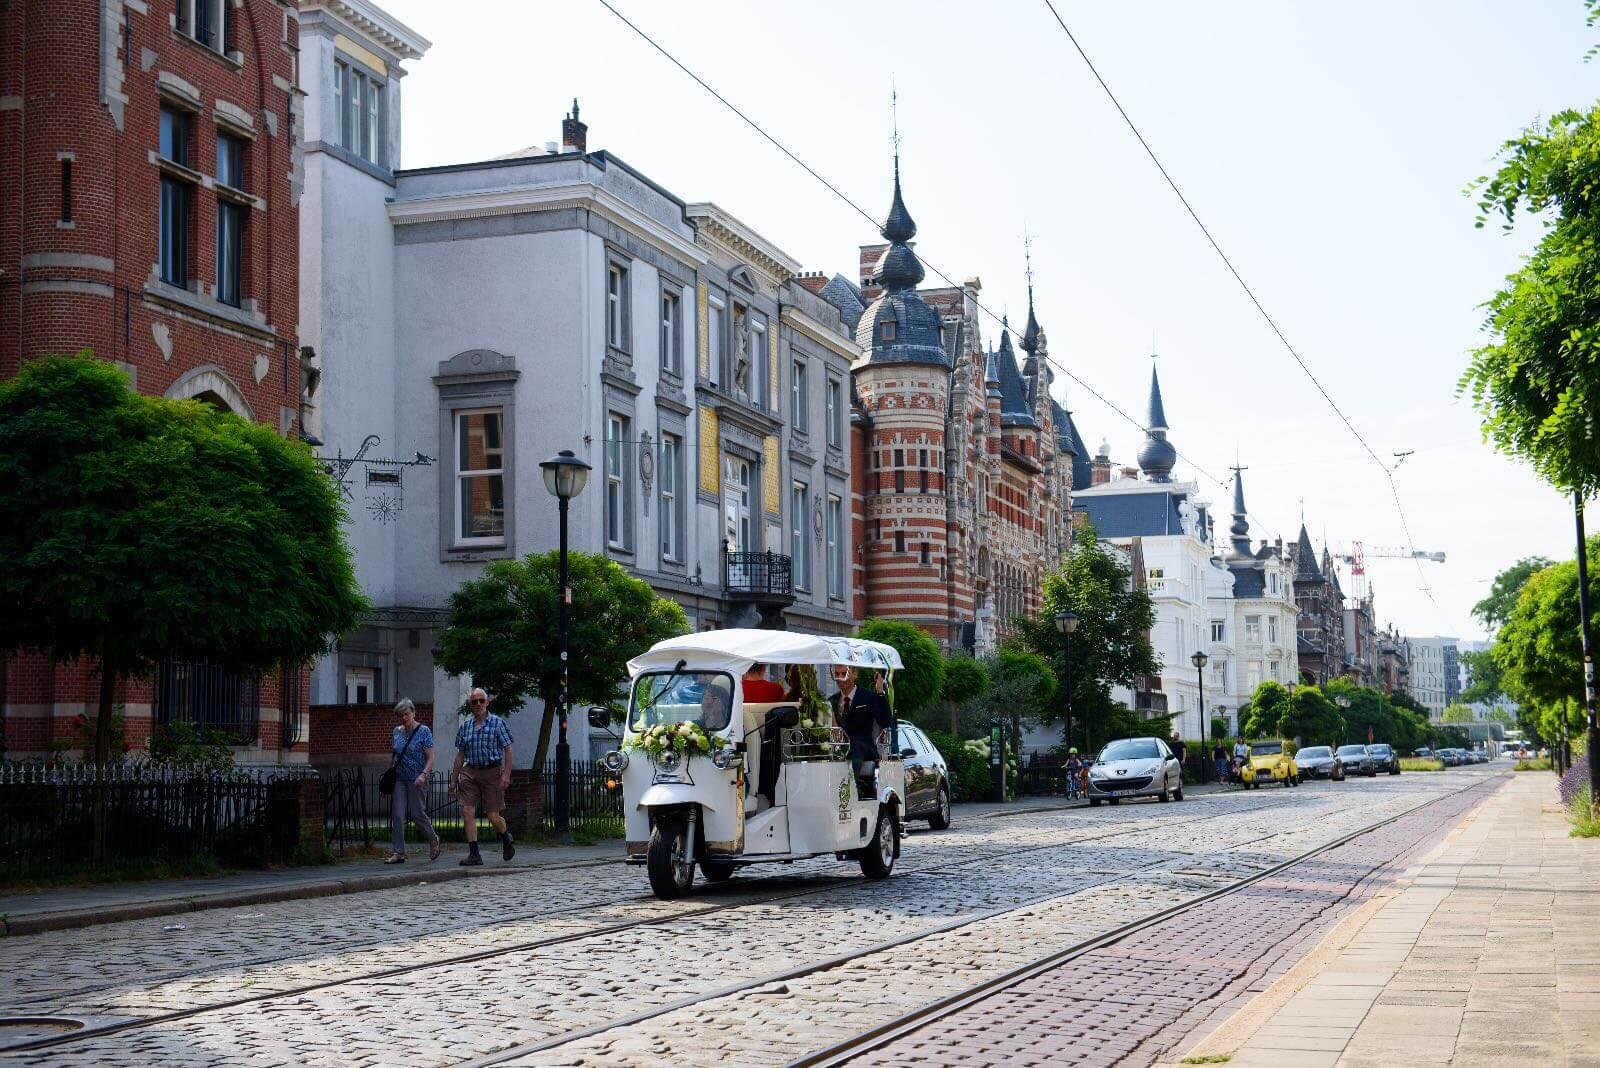 Улица Cogels – Osylei в районе Zurenborg